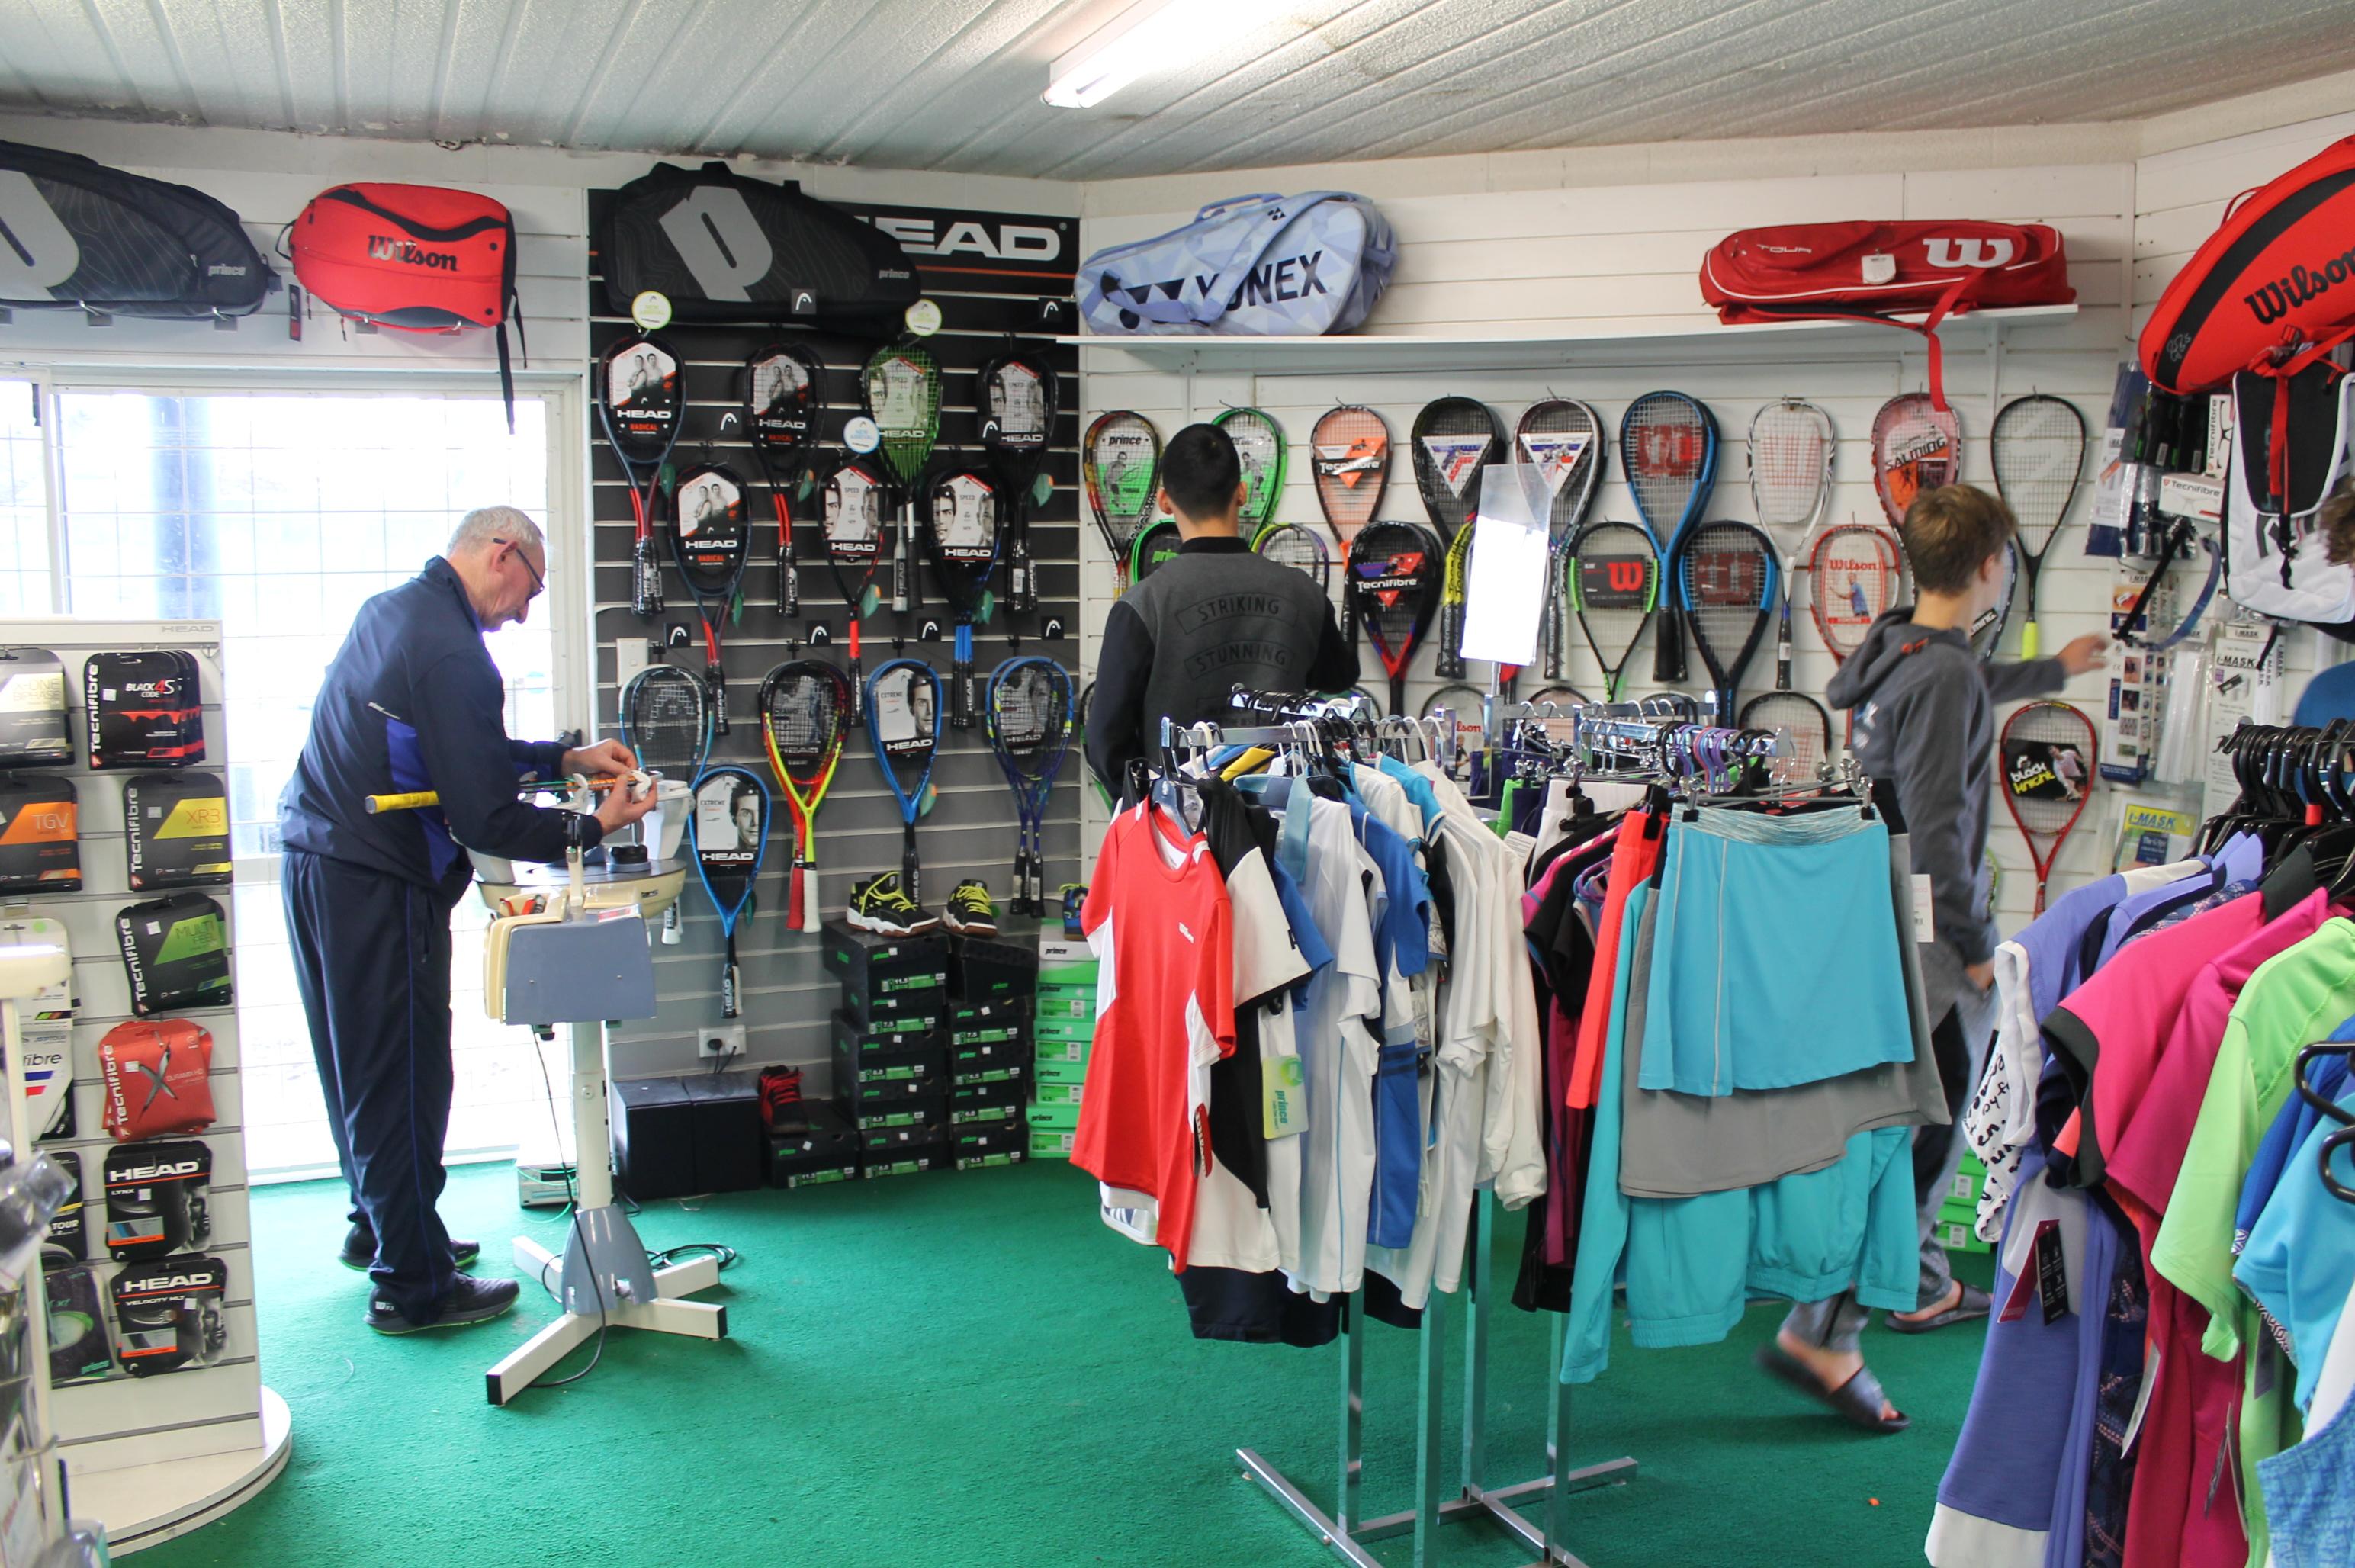 Pro shop racquet restring